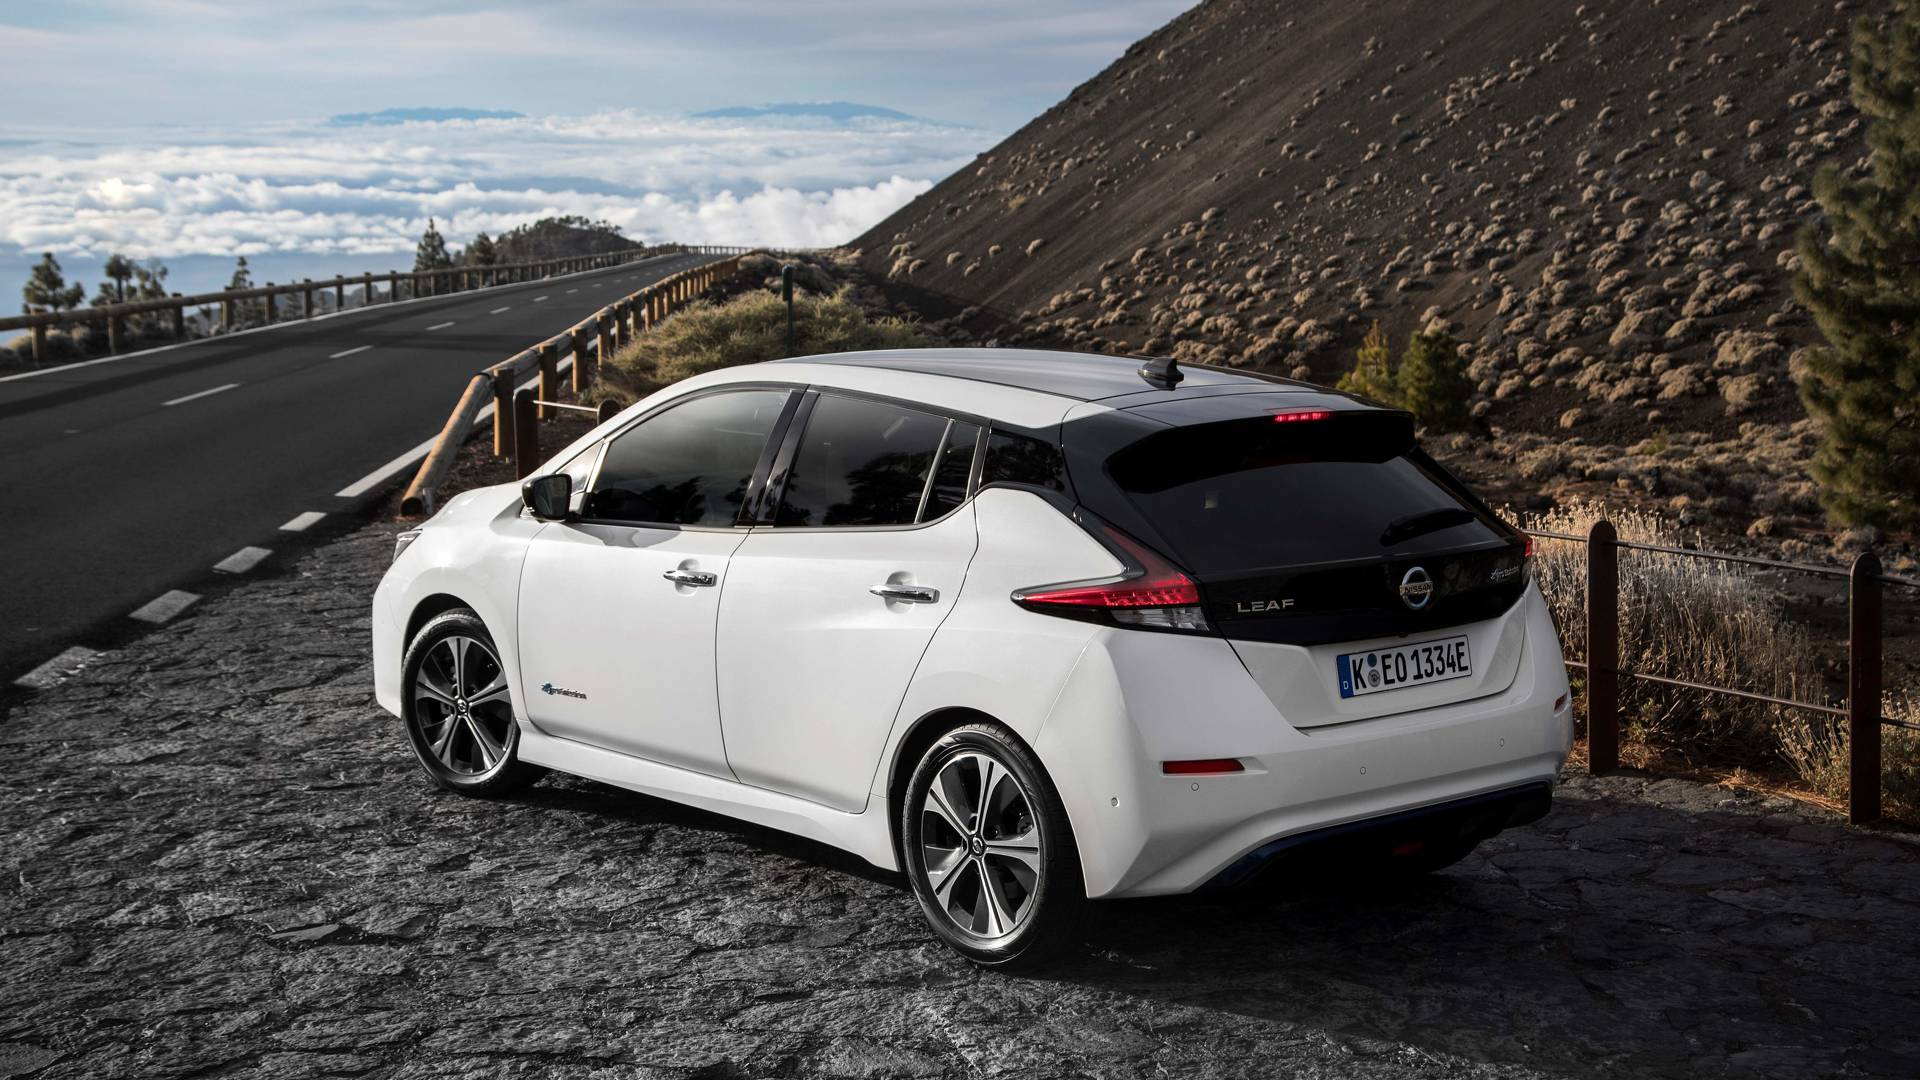 Продажи Nissan LEAF в США снизились на 68% во втором квартале 2020 года